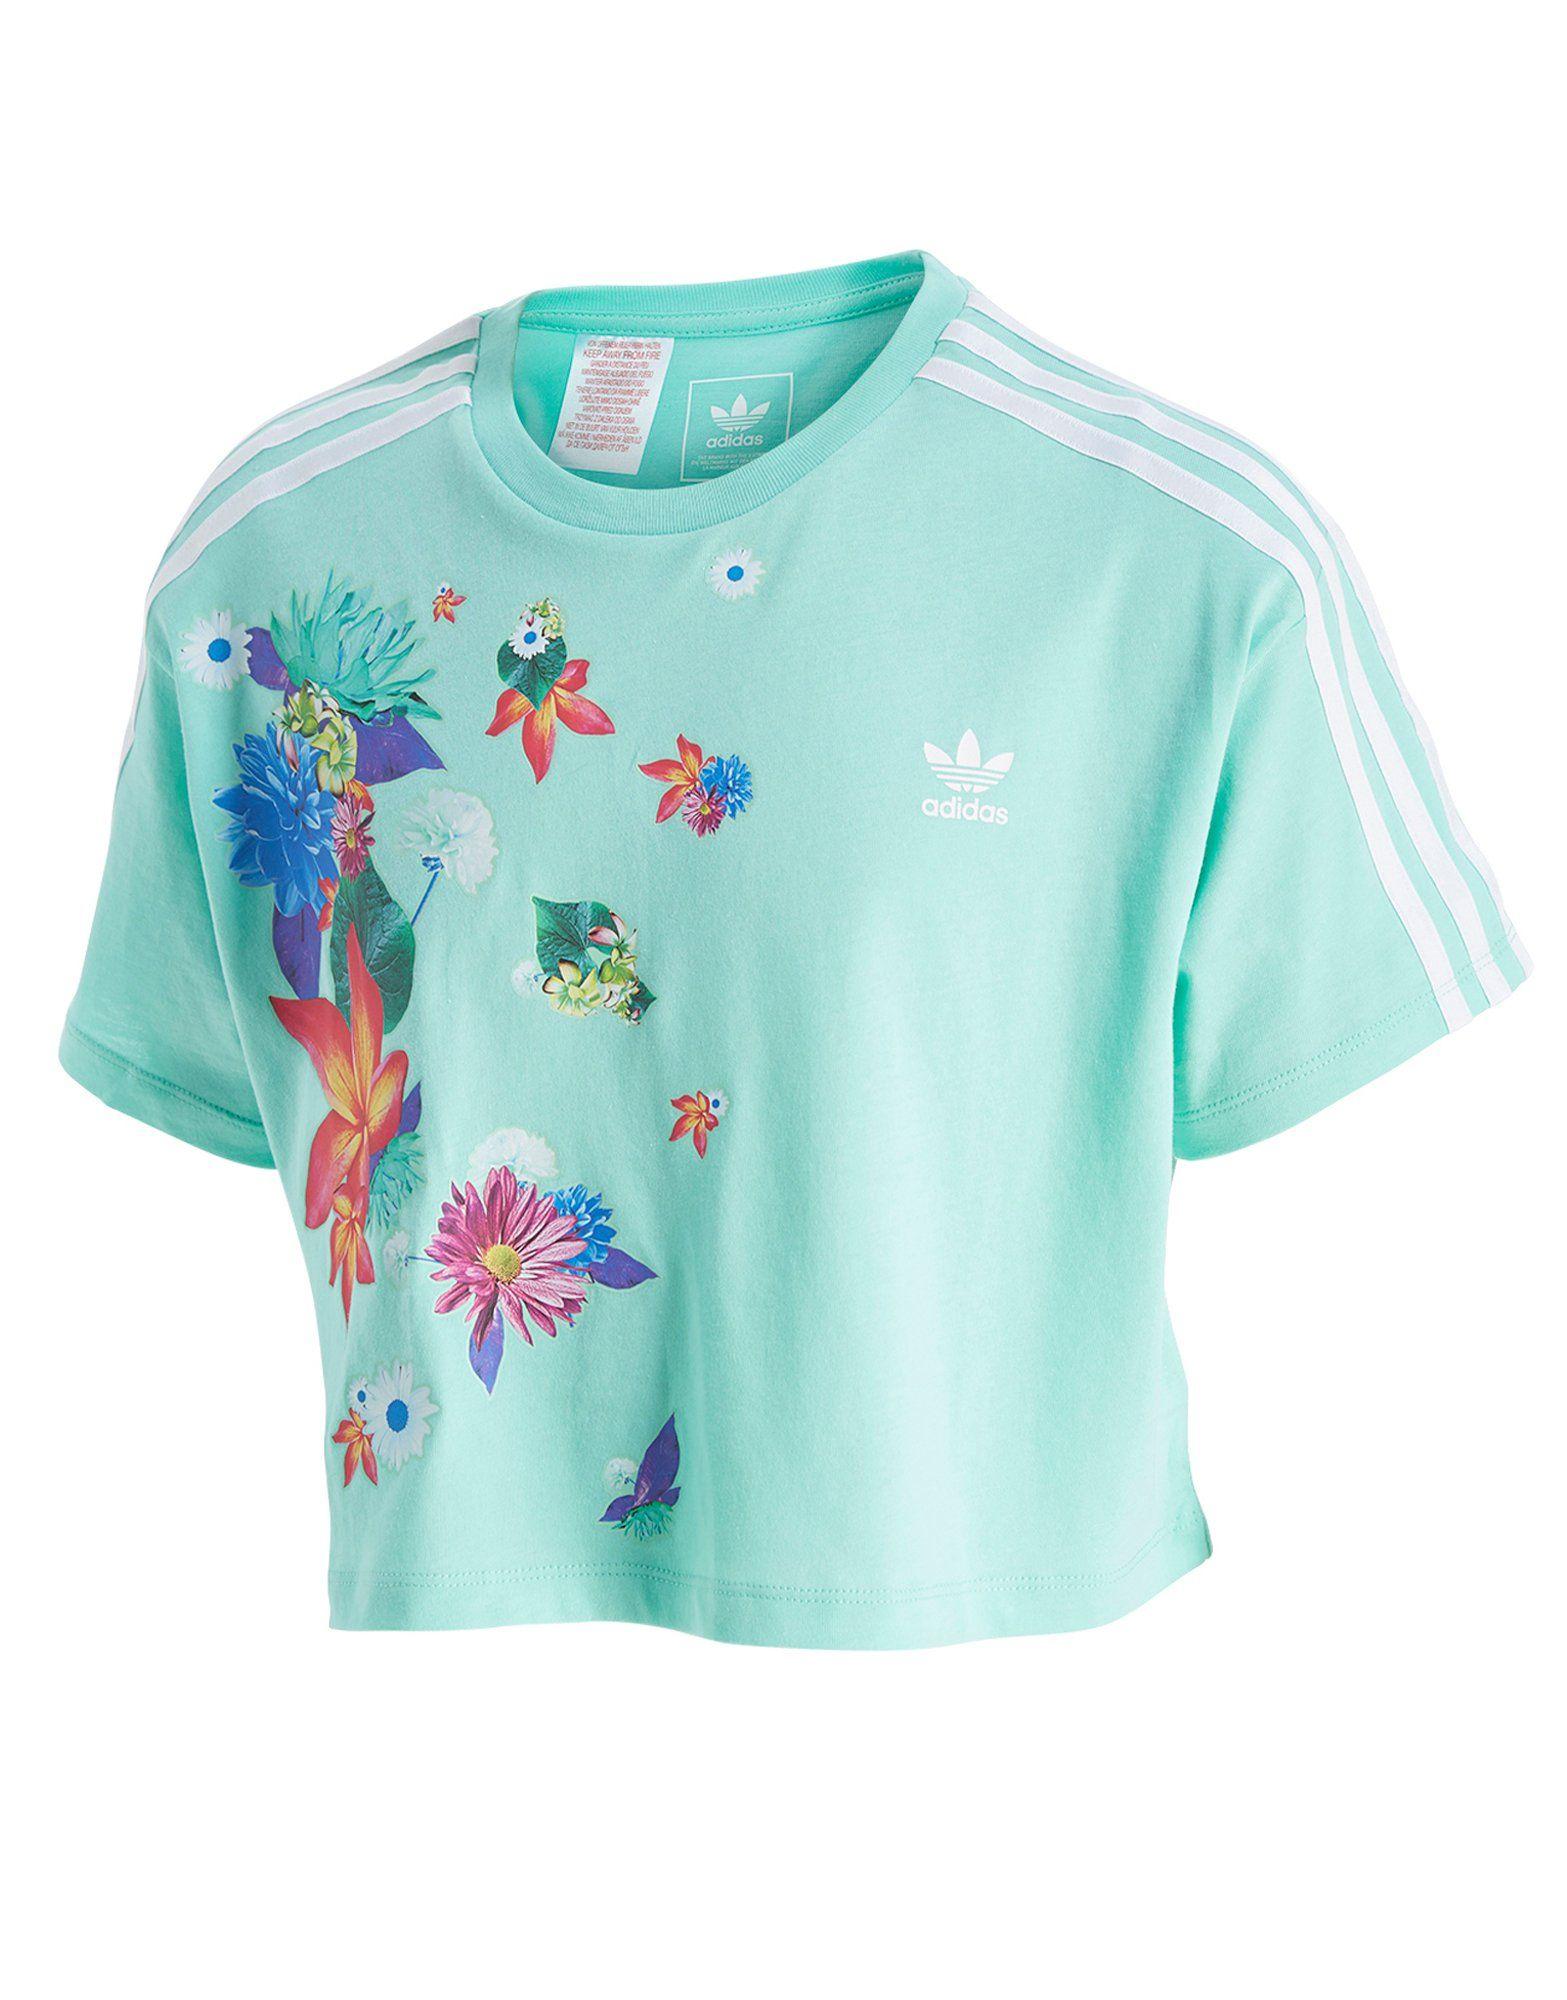 adidas Originals T-shirt Girls' Floral Crop Junior